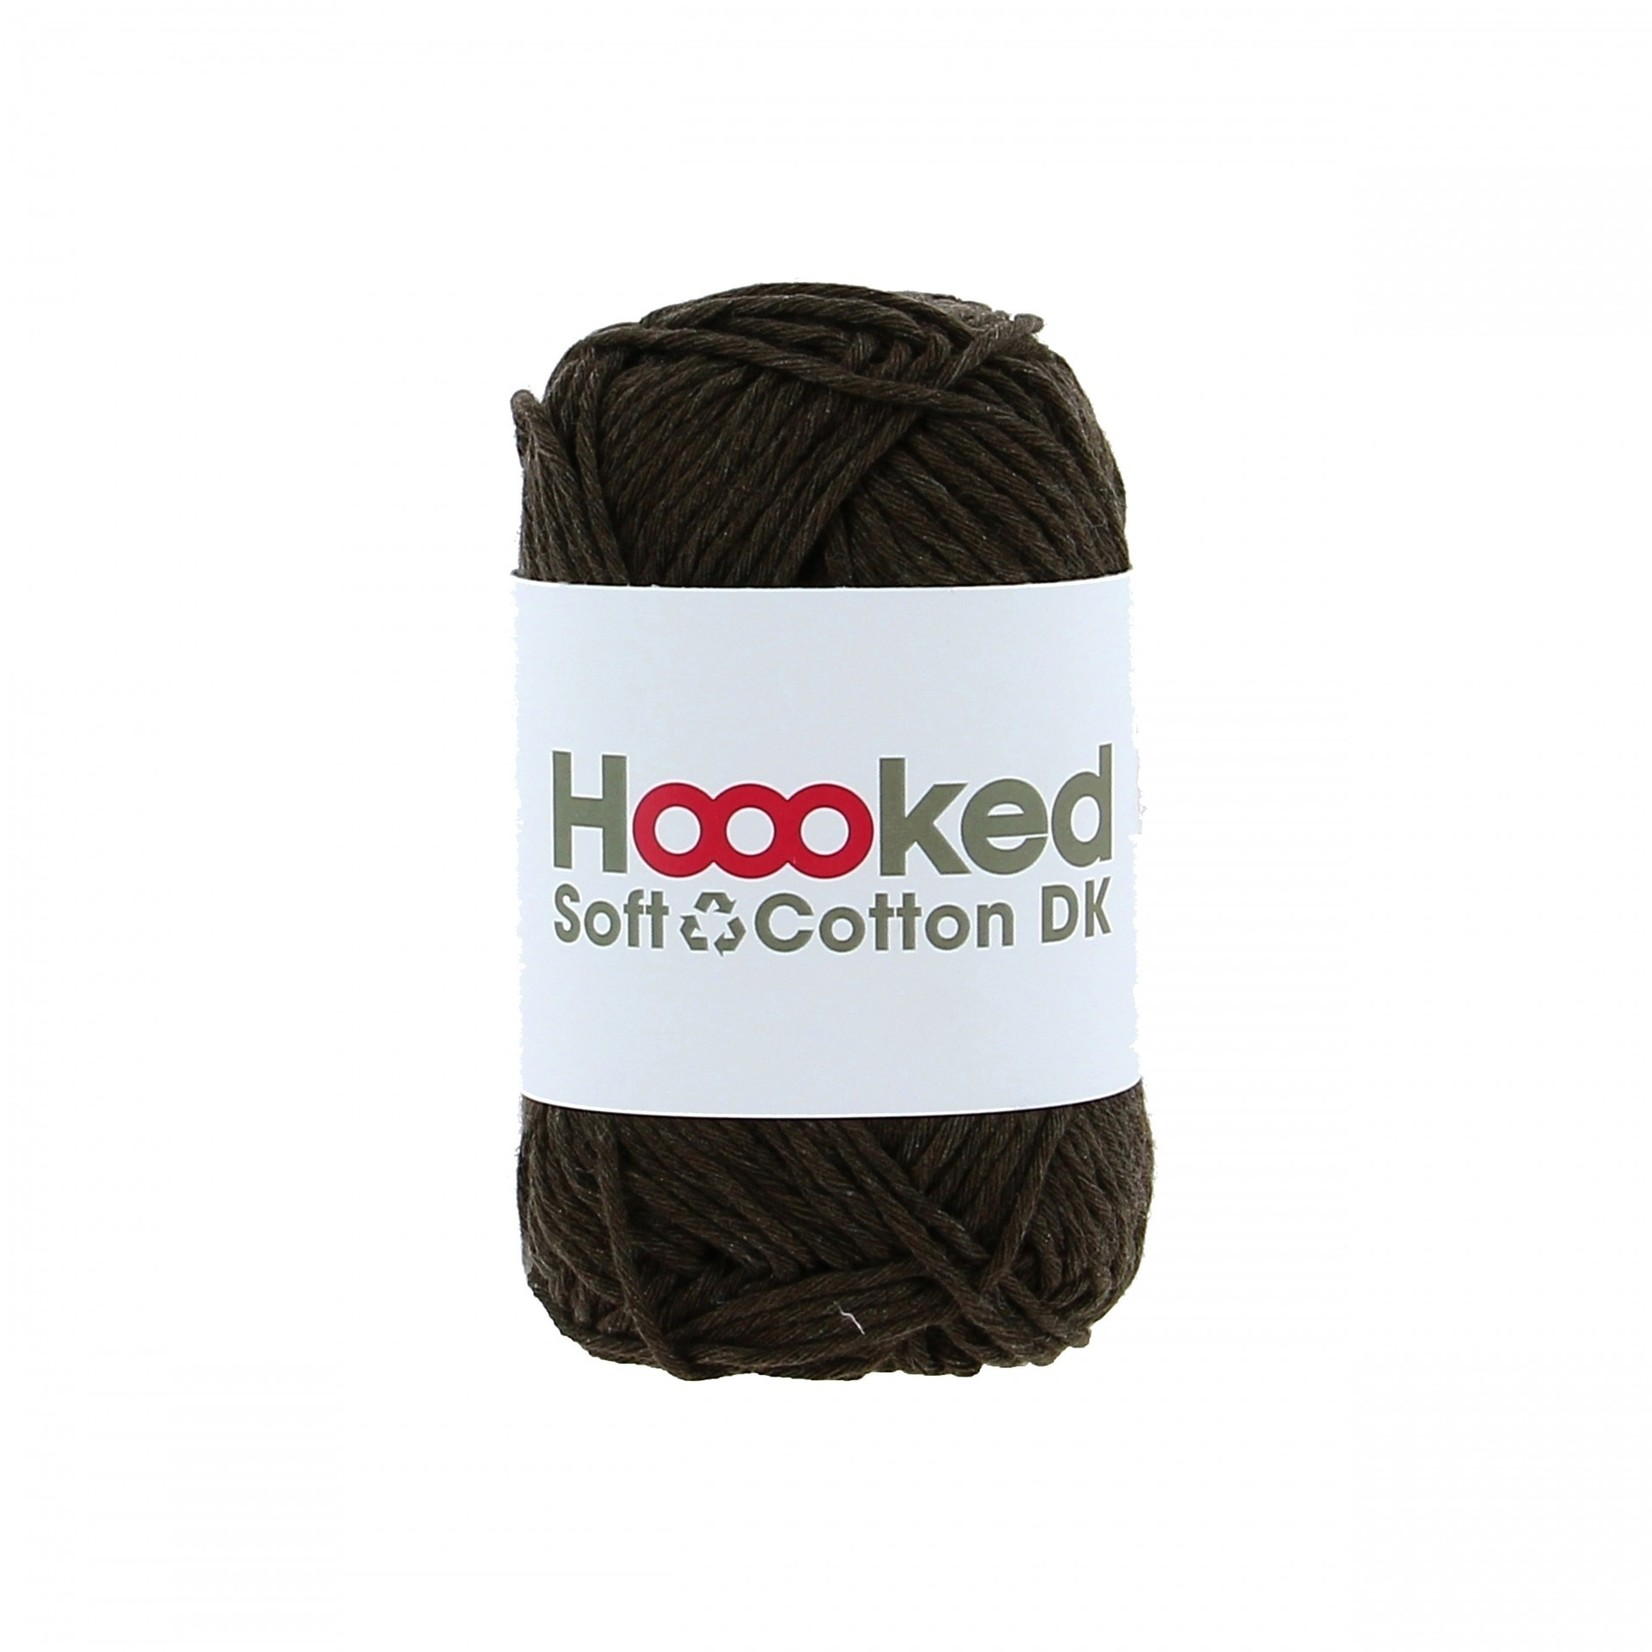 Hoooked Hoooked Soft Cotton DK Havana Brown - bundel 5 x 50 gr. / 85 m.